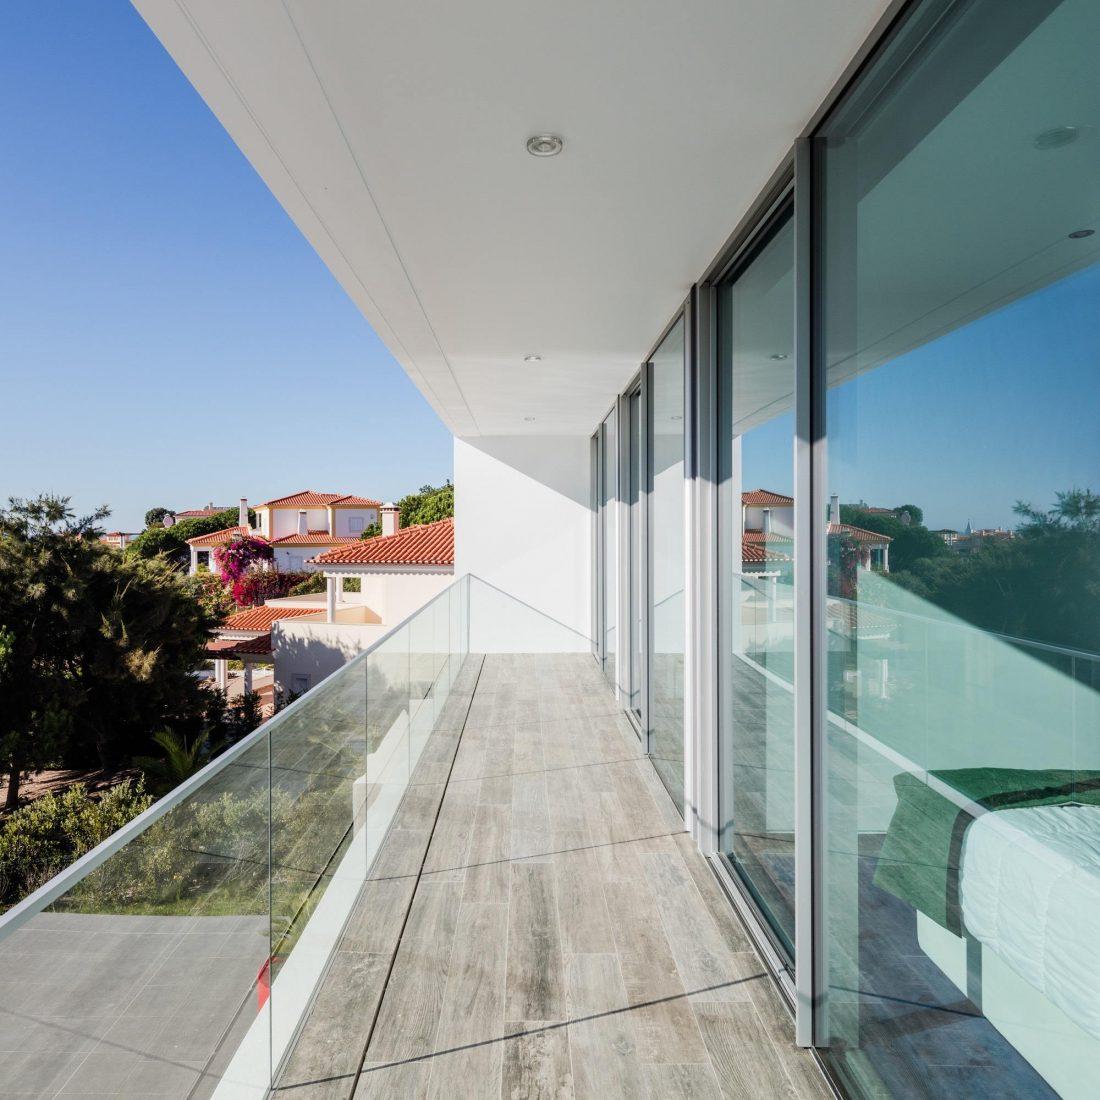 Дом в Обидуше, Португалия, от студии RSM arquitecto и Russell Jones Architects 19